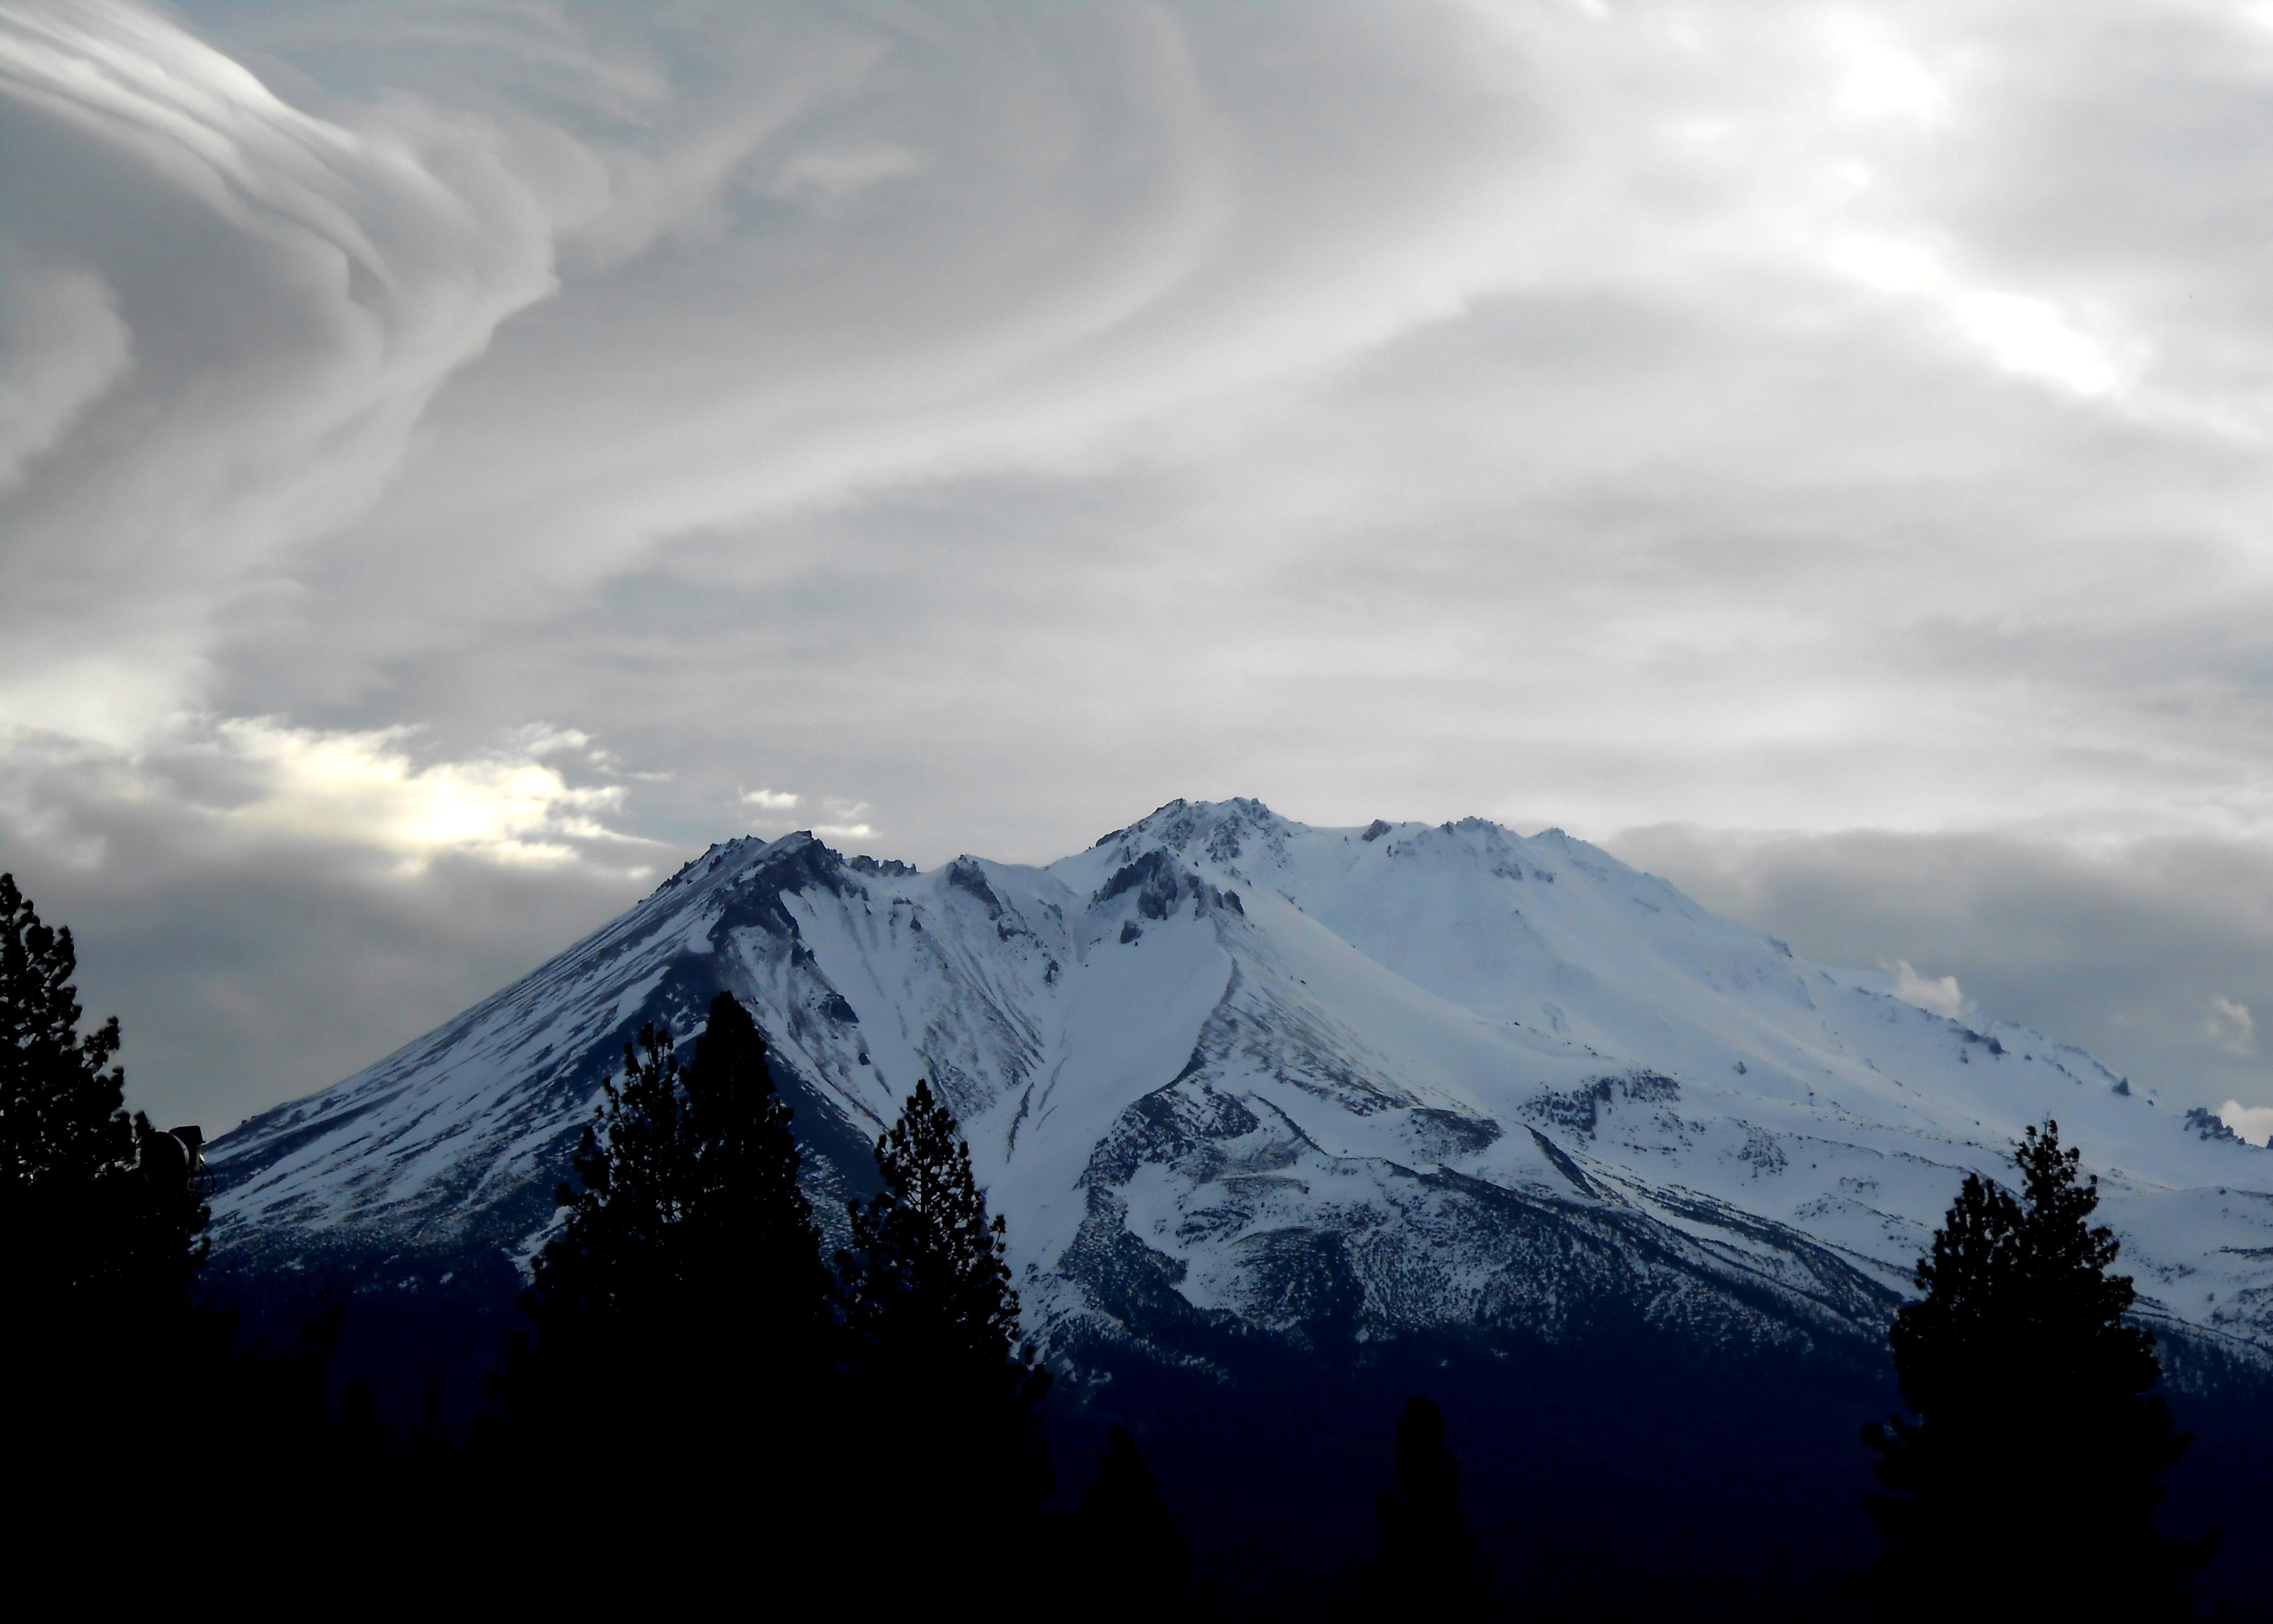 Weed, CA : Mt. Shasta photo, picture, image (California) at city-data.com